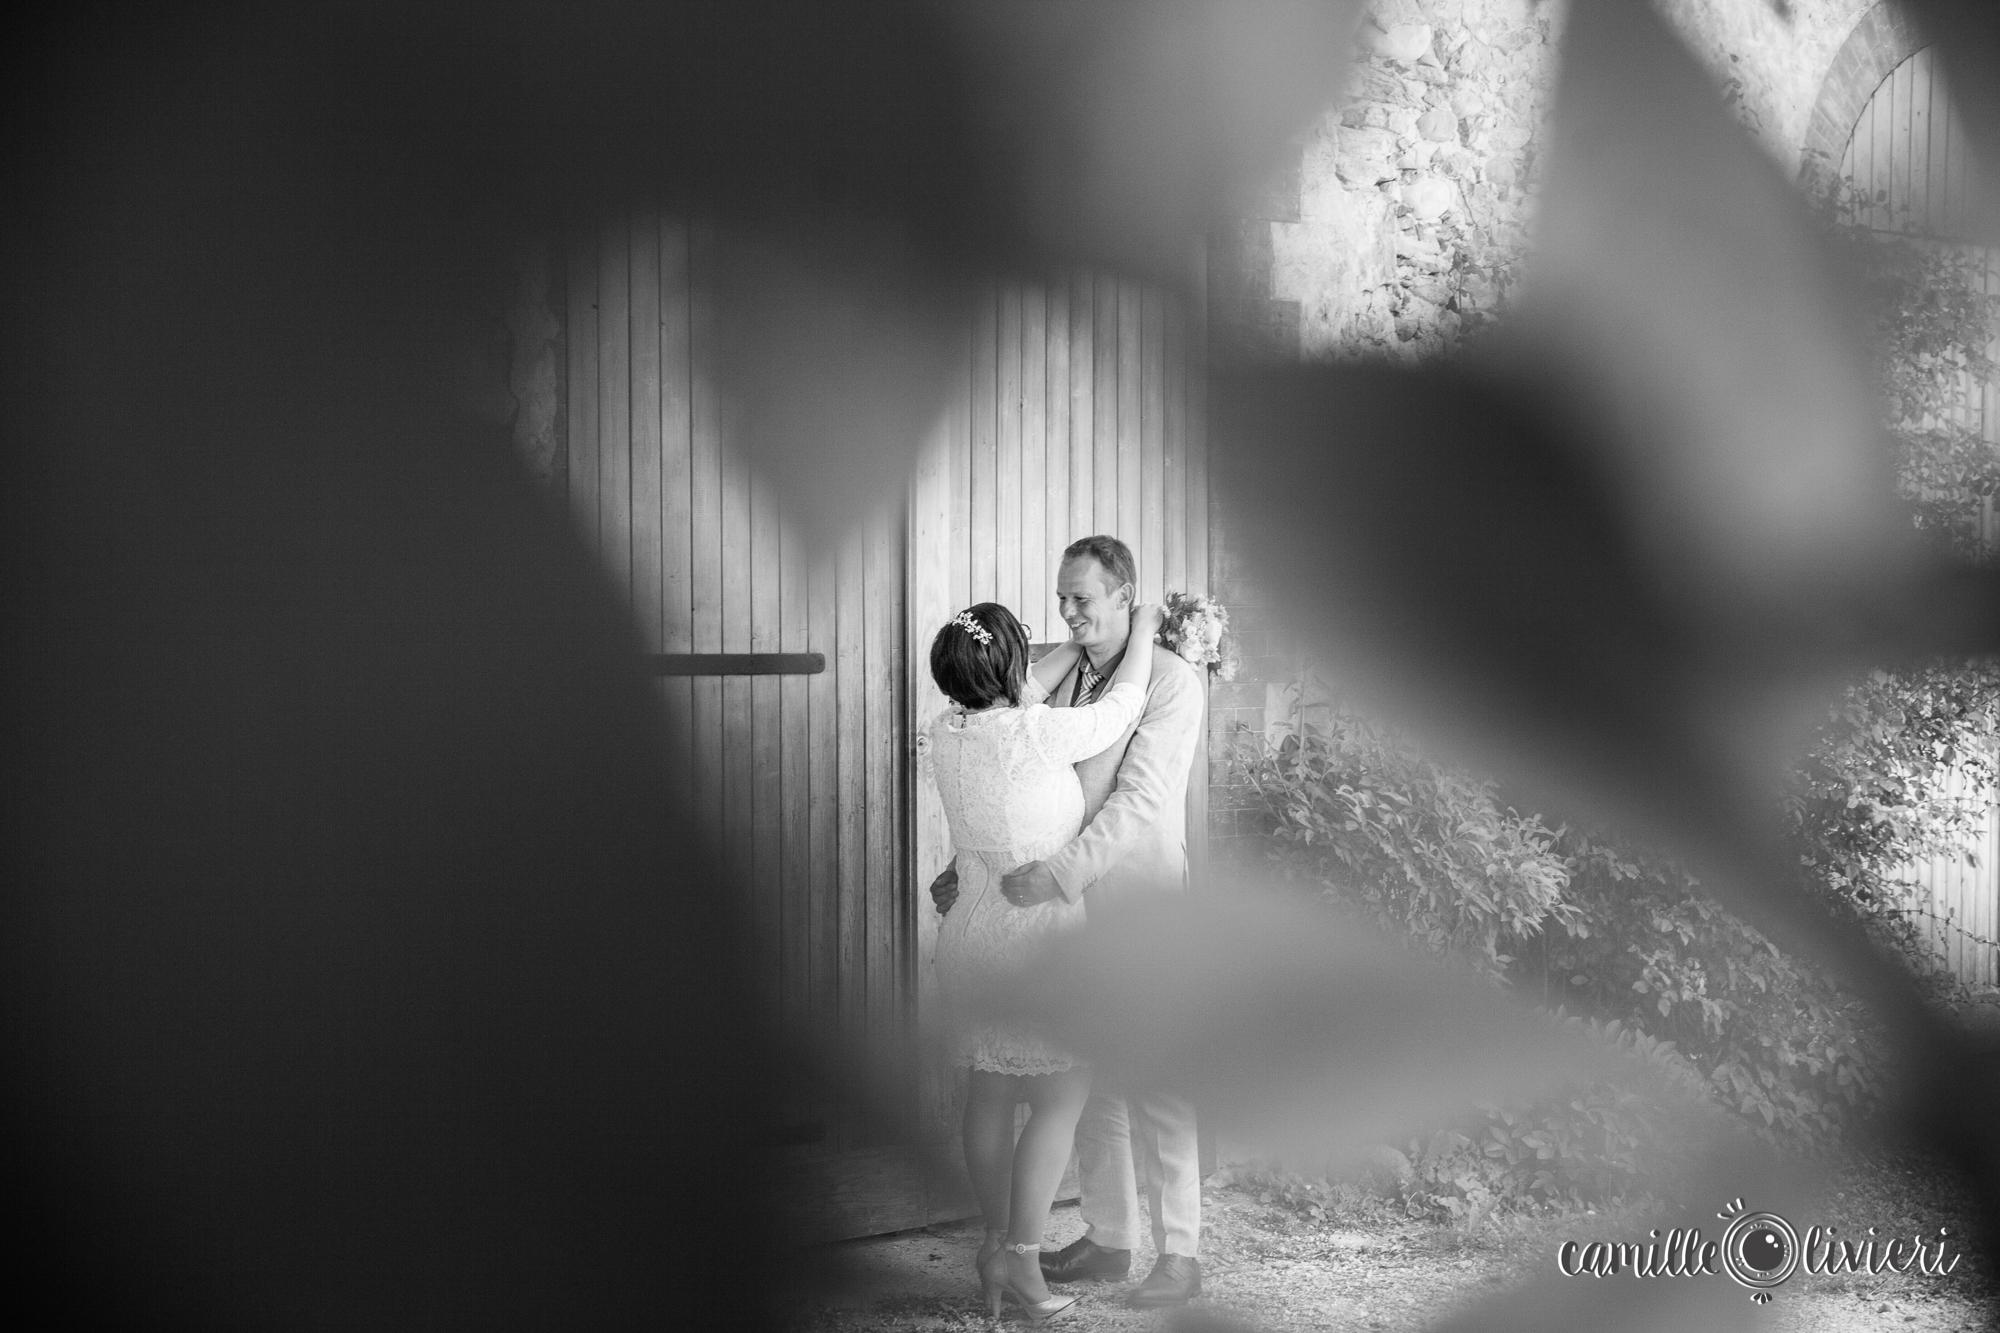 photographe_grenoble_mariage-camille-olivieri-52